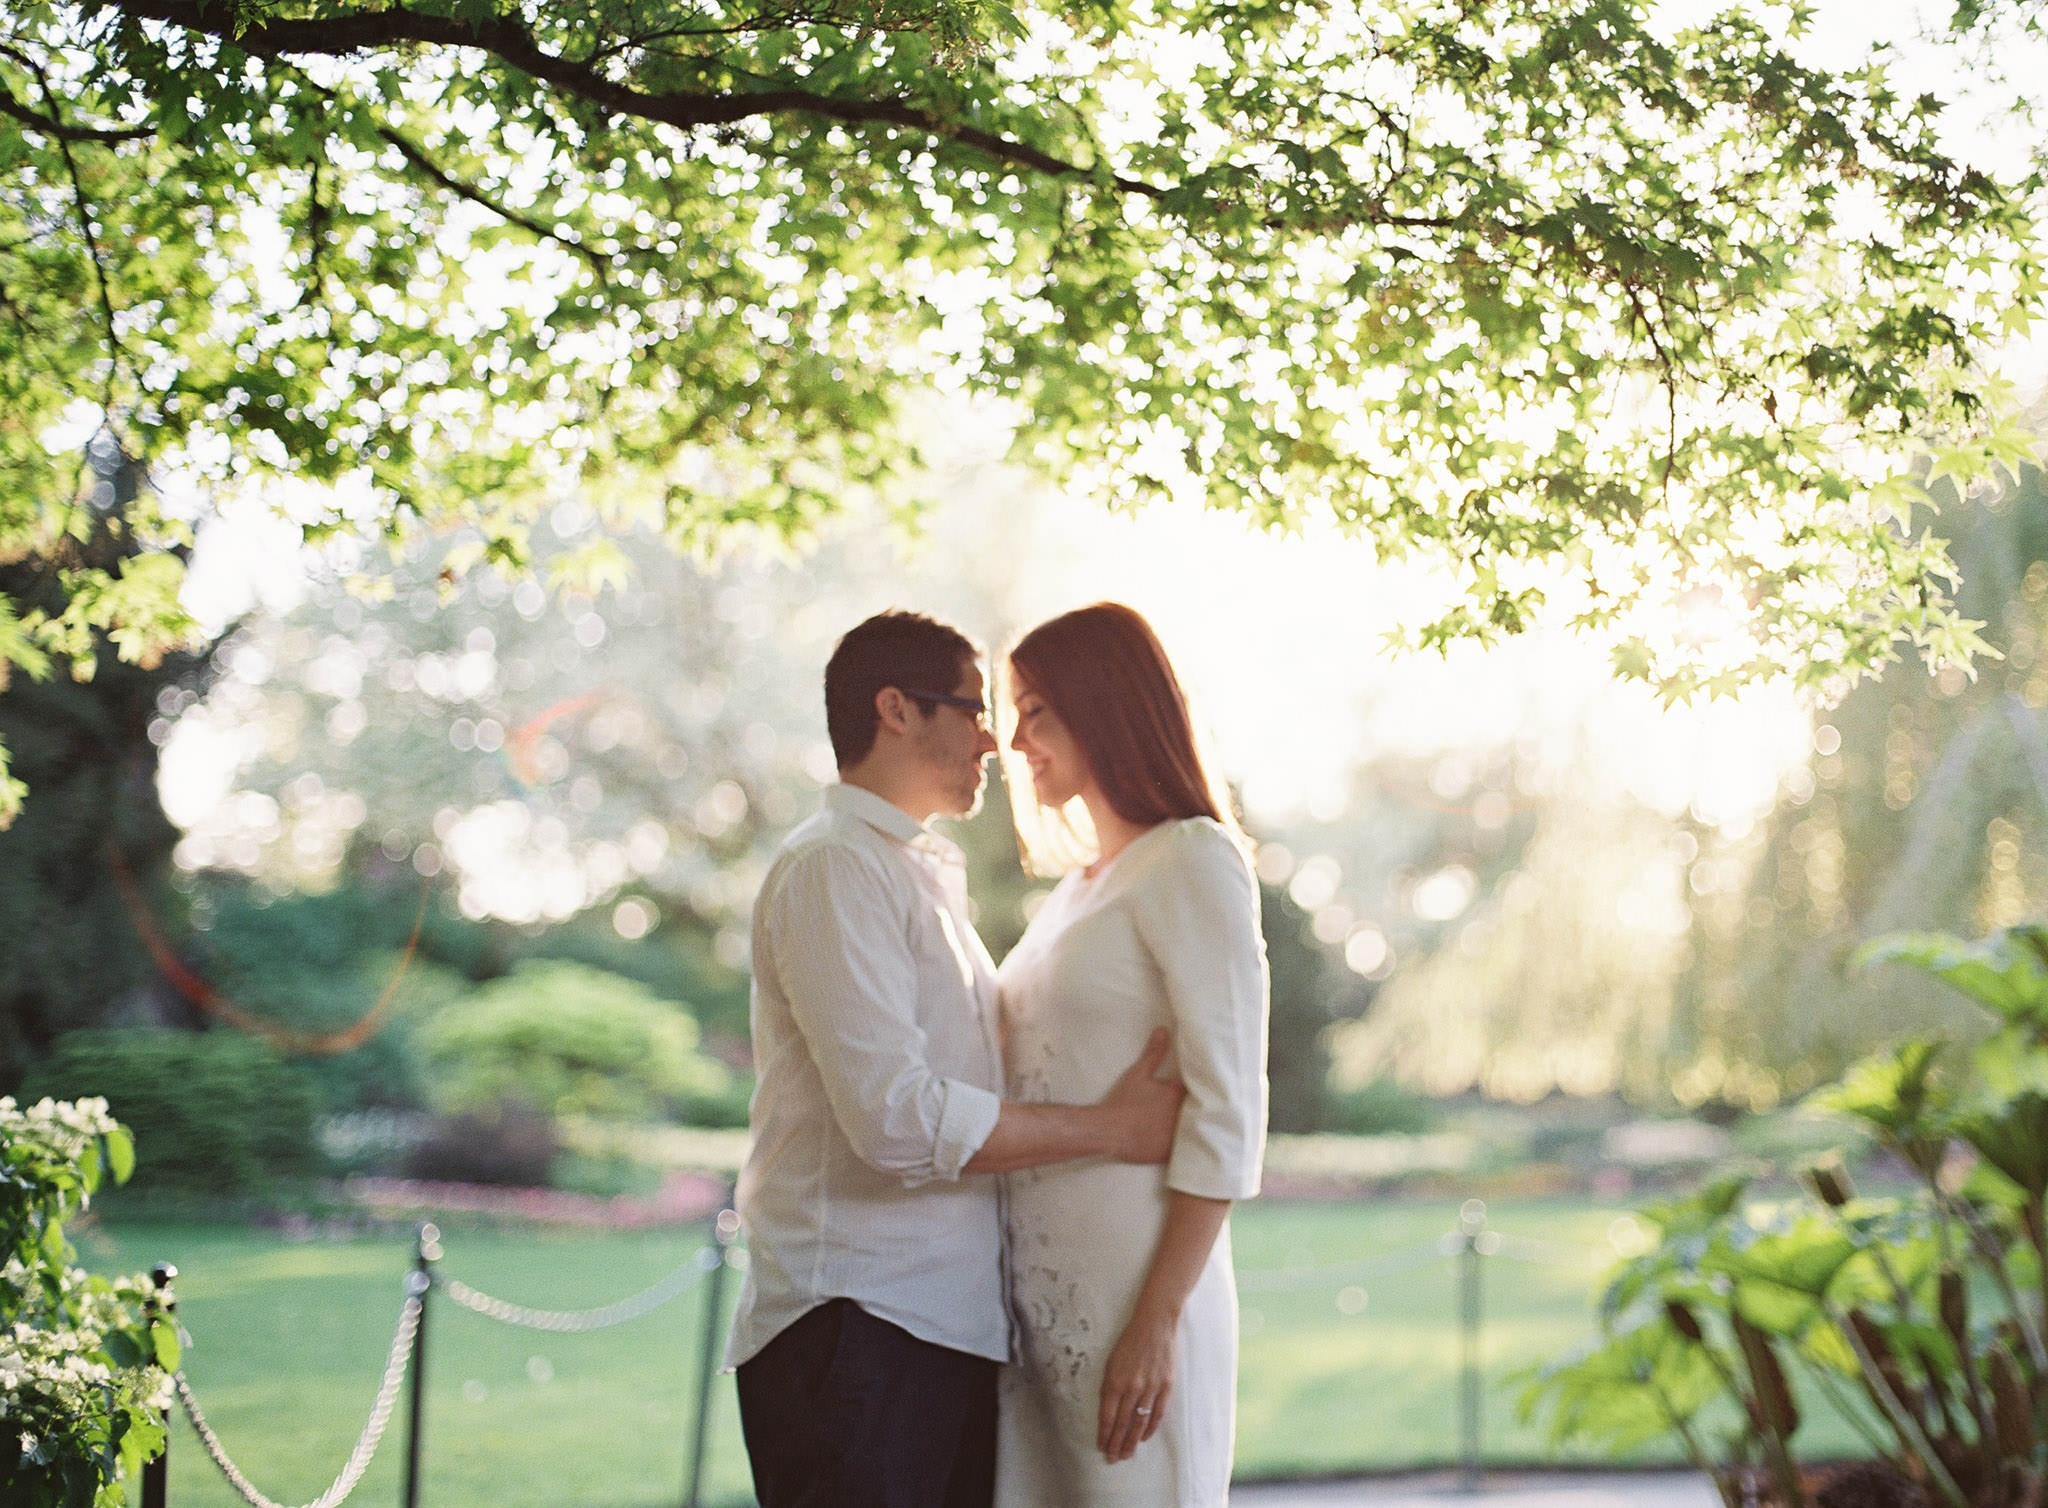 Surprise proposal at Queen Elizabeth Park in Vancouver